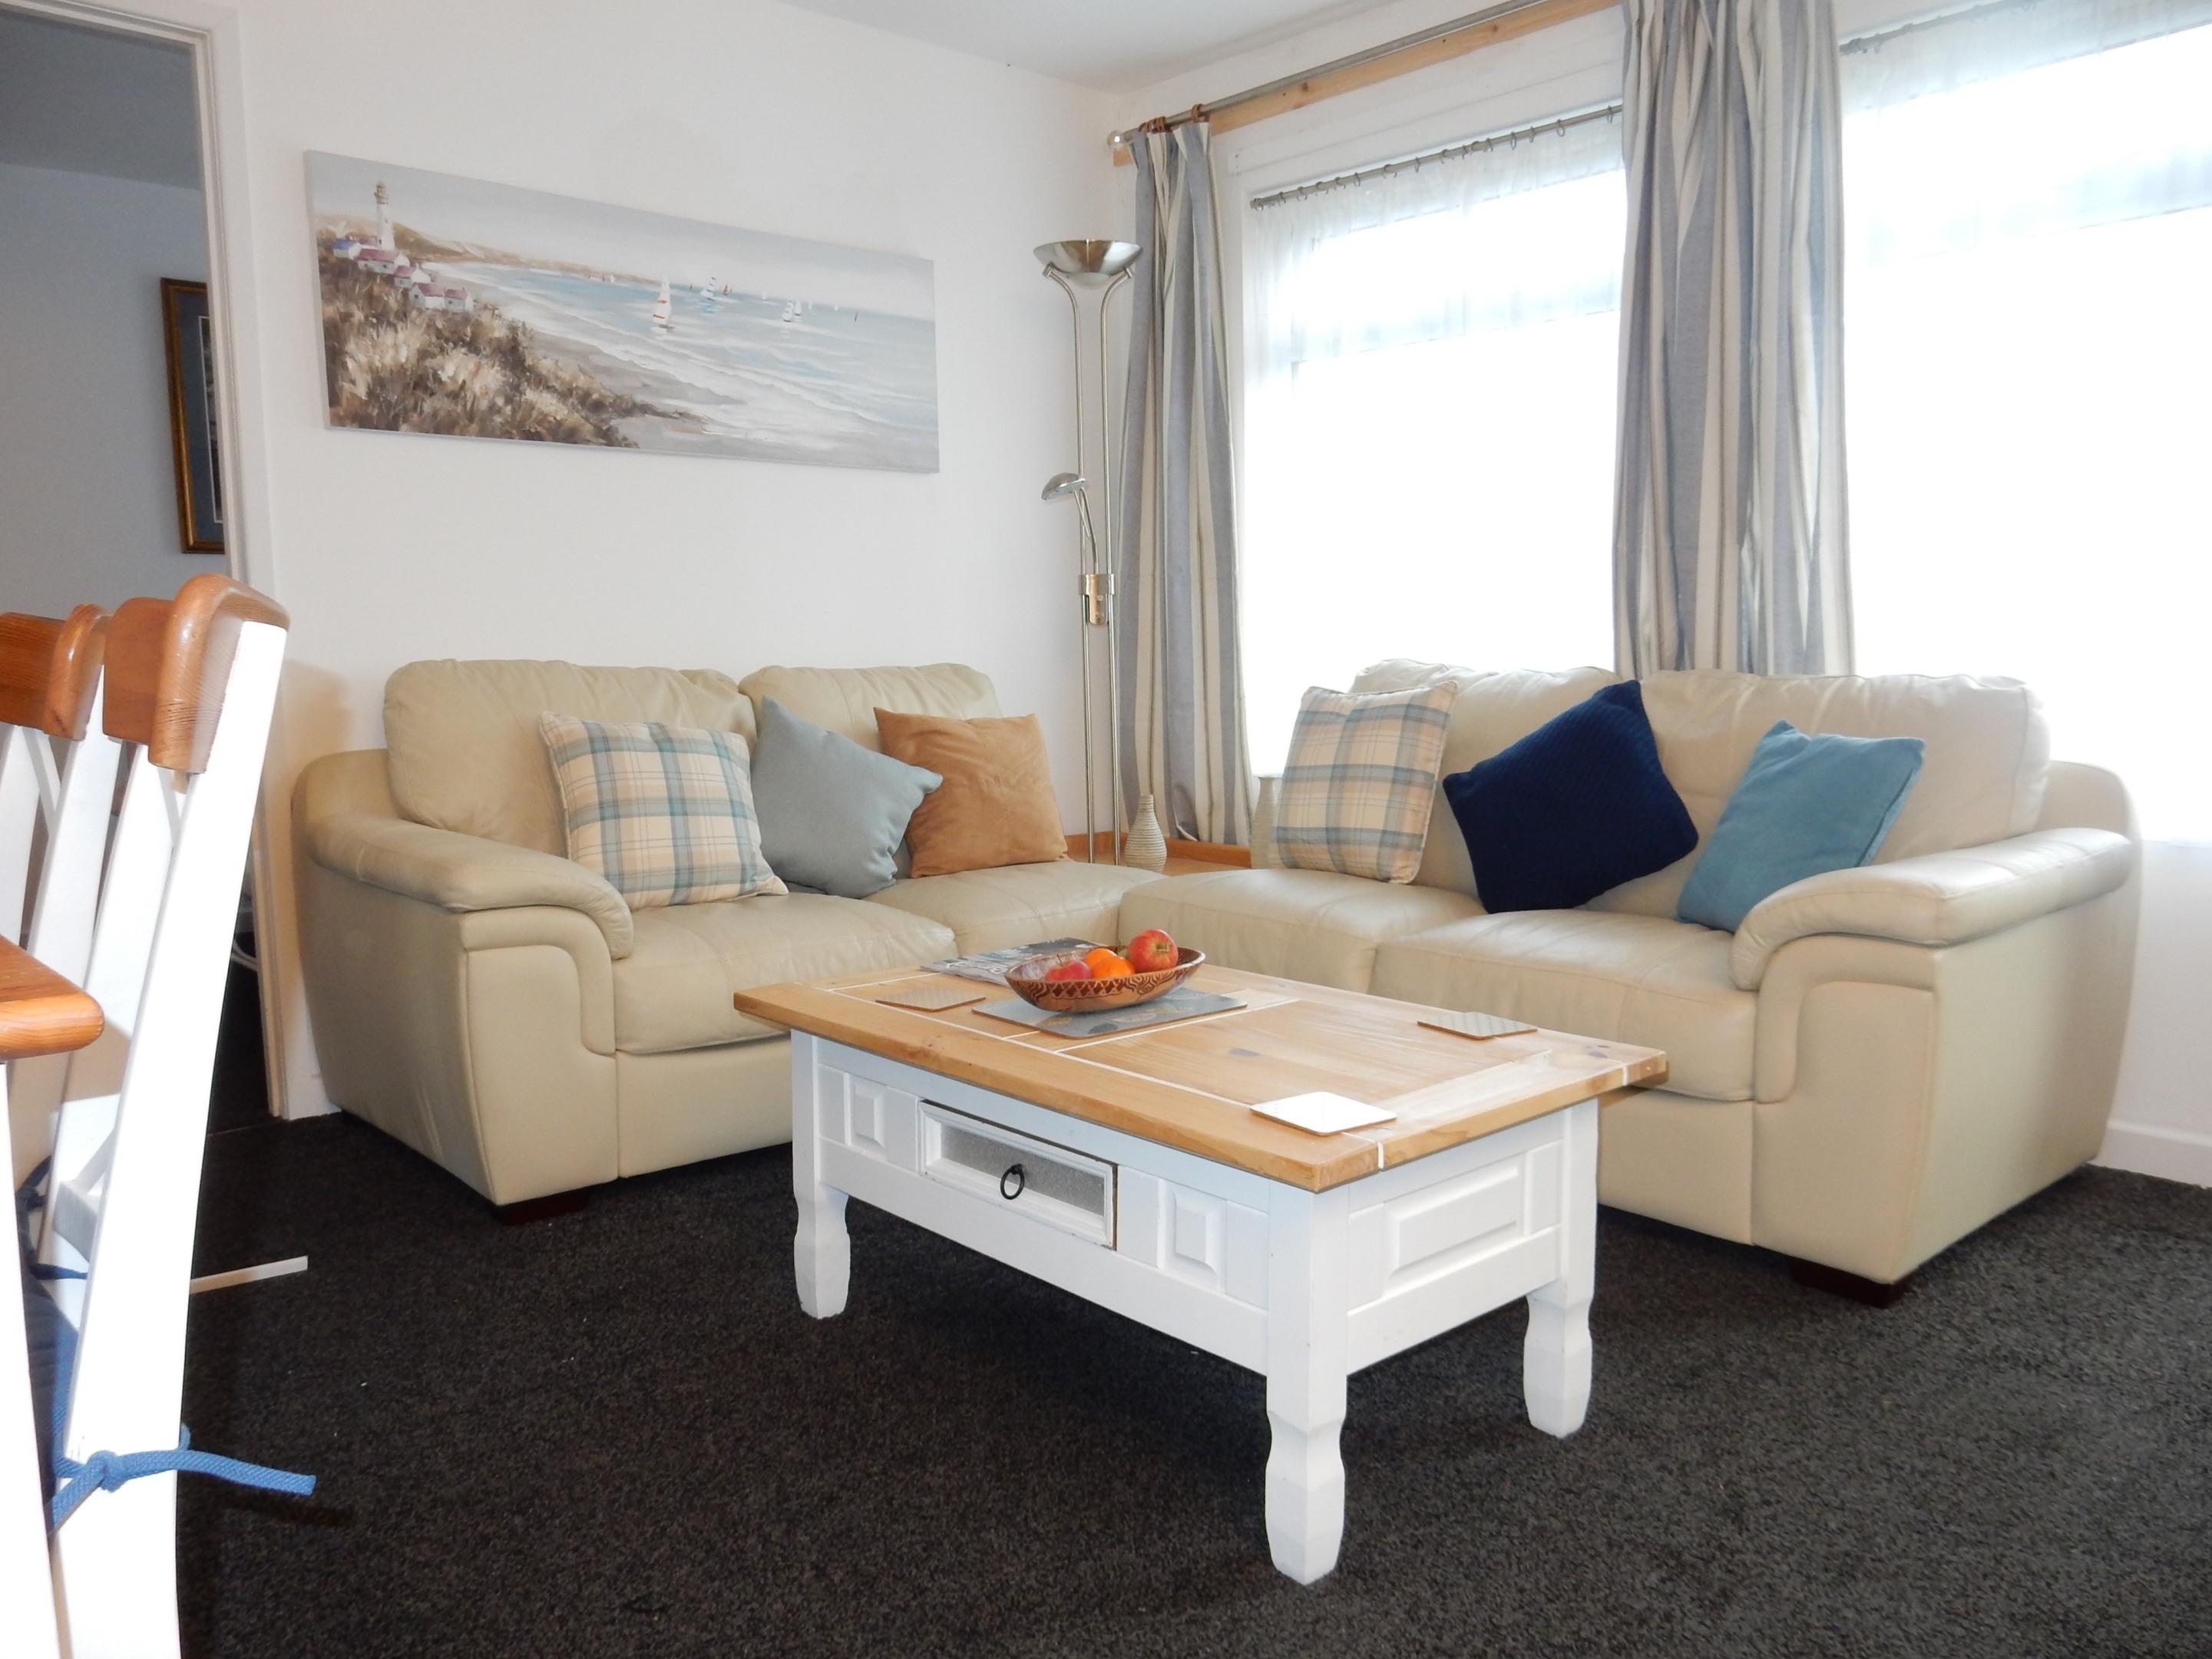 2 bedroom-Chalet-Classic-Ensuite-Park View - Basic  Rate